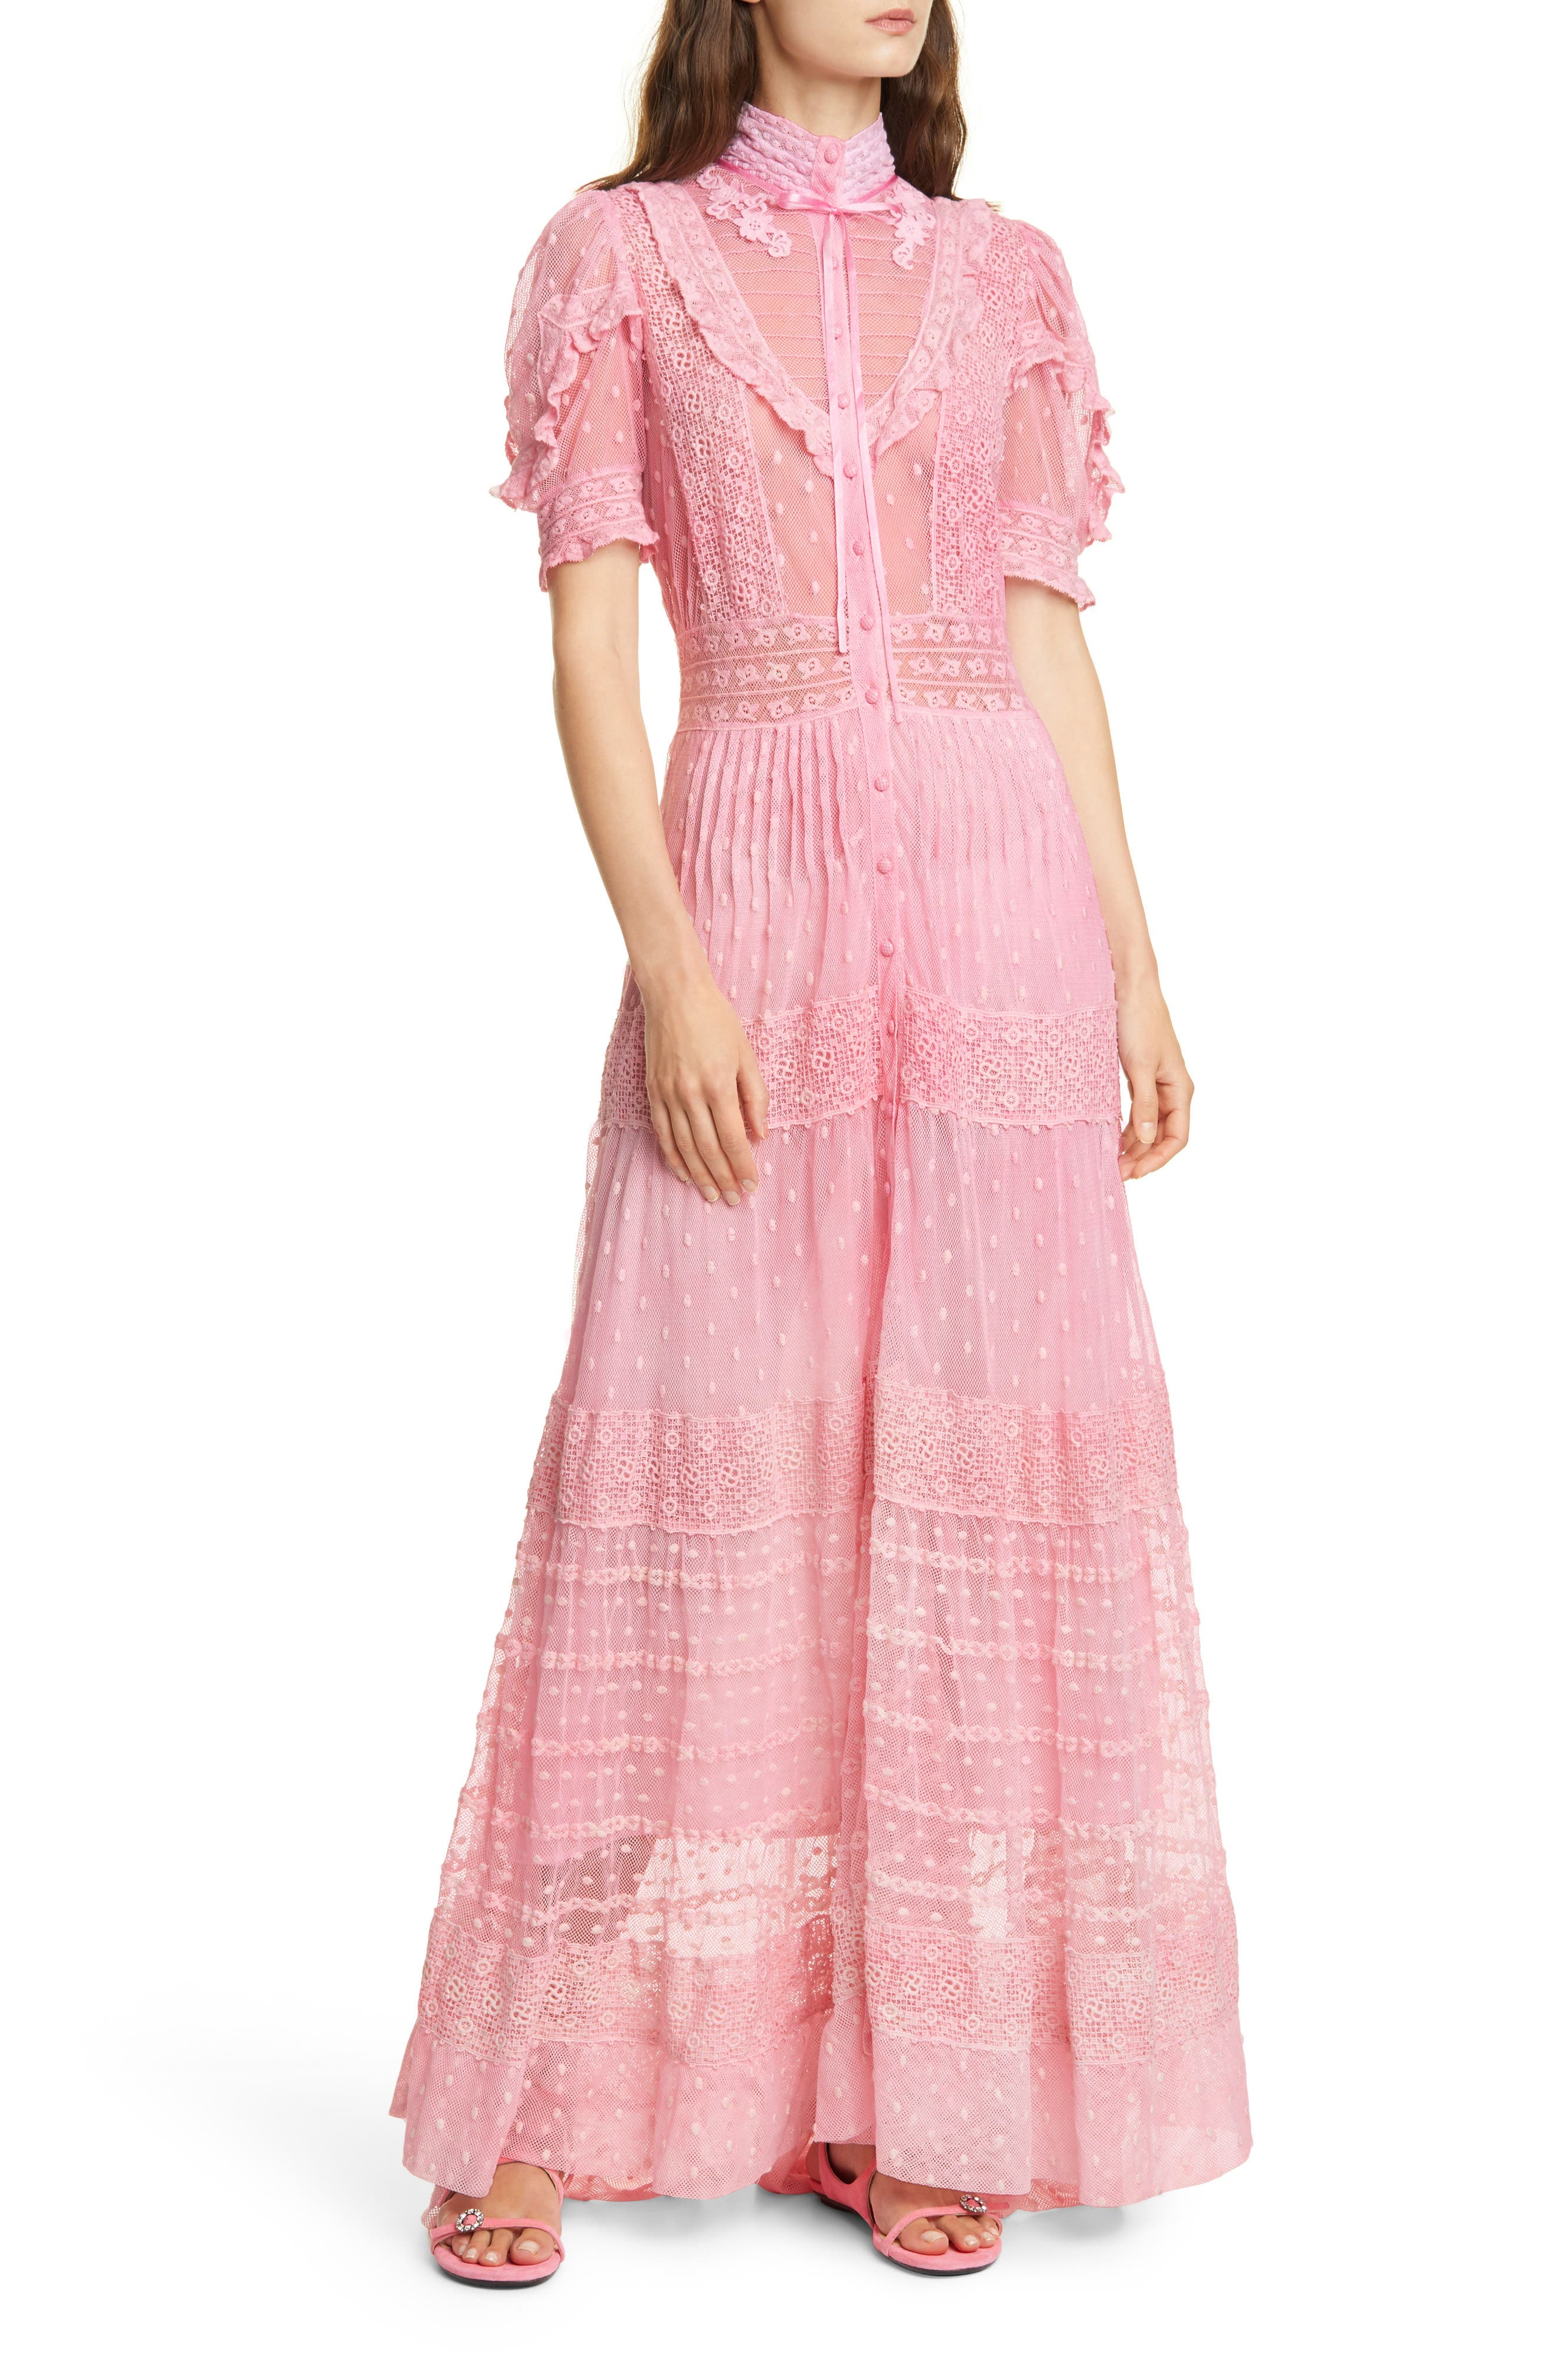 70s Prom, Formal, Evening, Party Dresses Womens Loveshackfancy Priya Lace  Swiss Dot Maxi Dress Size 8 - Pink $765.00 AT vintagedancer.com